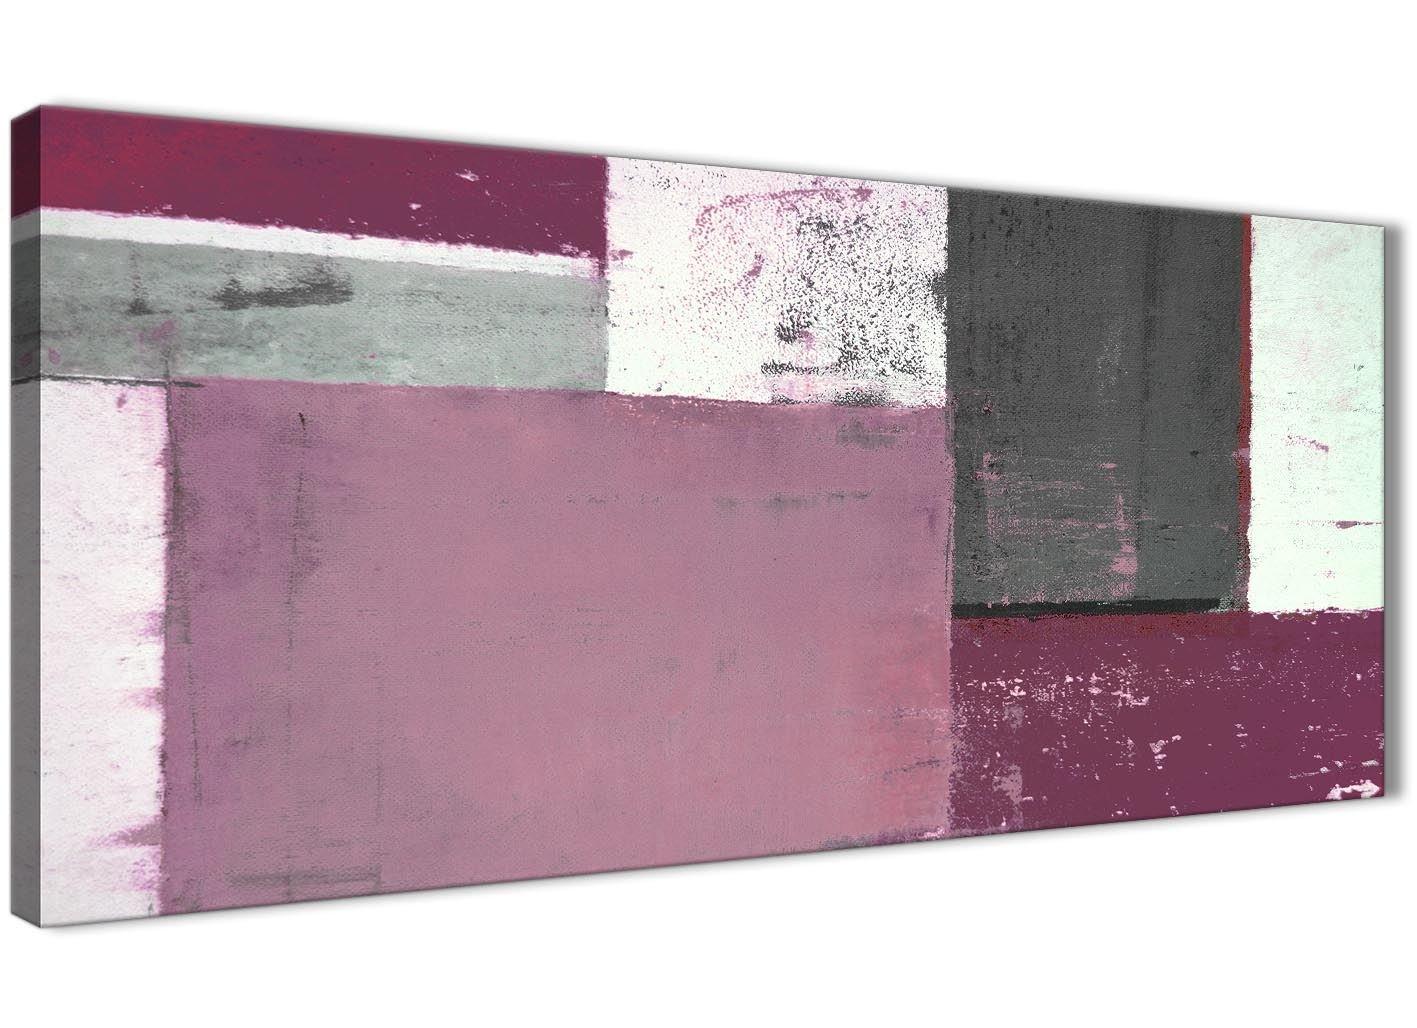 Color Prugna Per Pareti : Grigio prugna dipinto astratto tela da parete moderno largo 120 cm